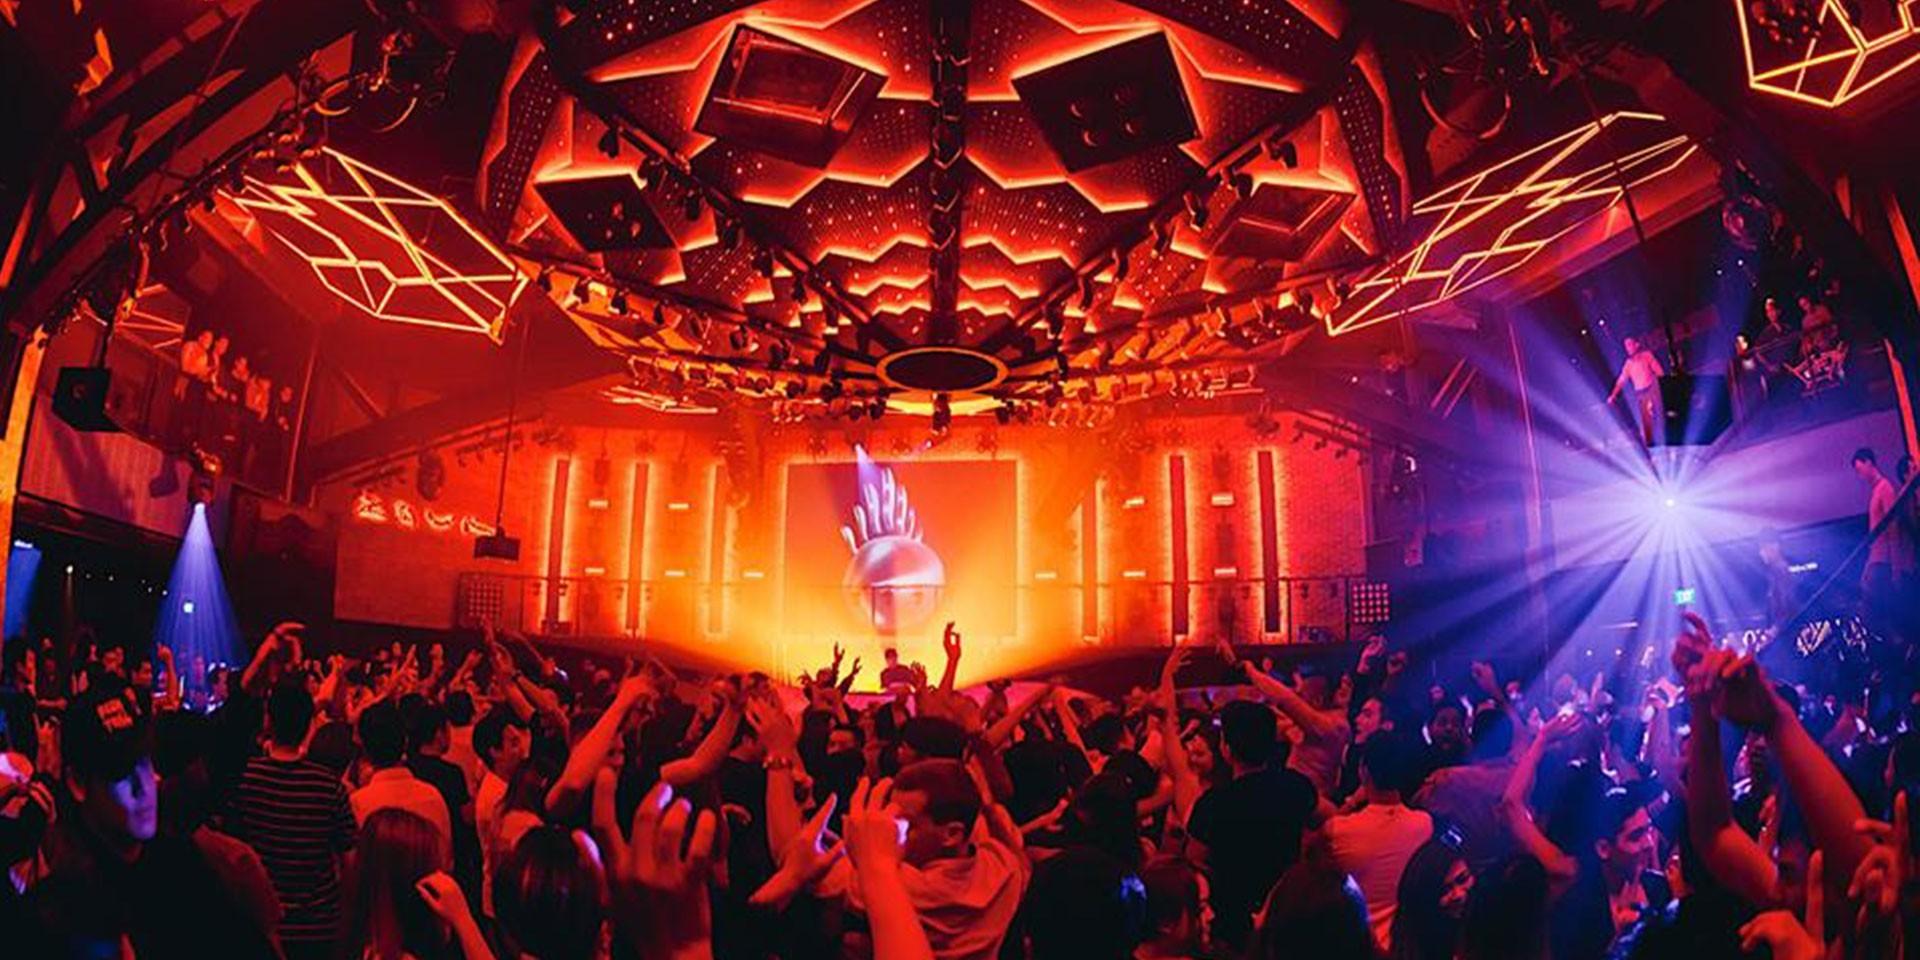 Zouk Singapore places third in DJ Mag's Top 100 Clubs list, Cé La Vi jumps up to  67